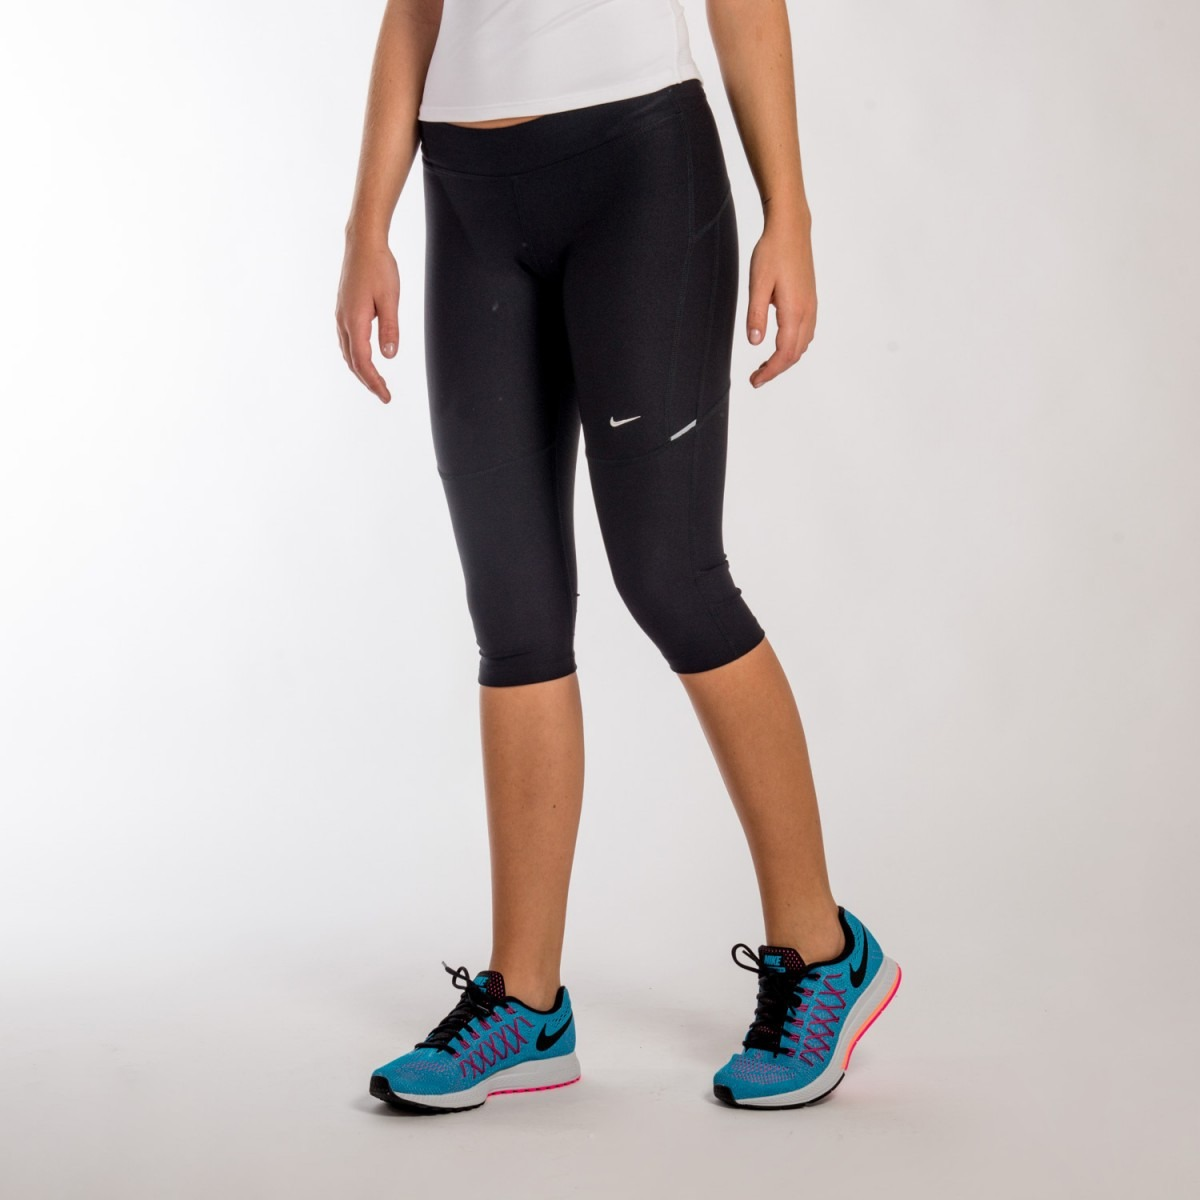 buy online 3c0c0 f5075 calza nike 34 capri mujer running. Cargando zoom.